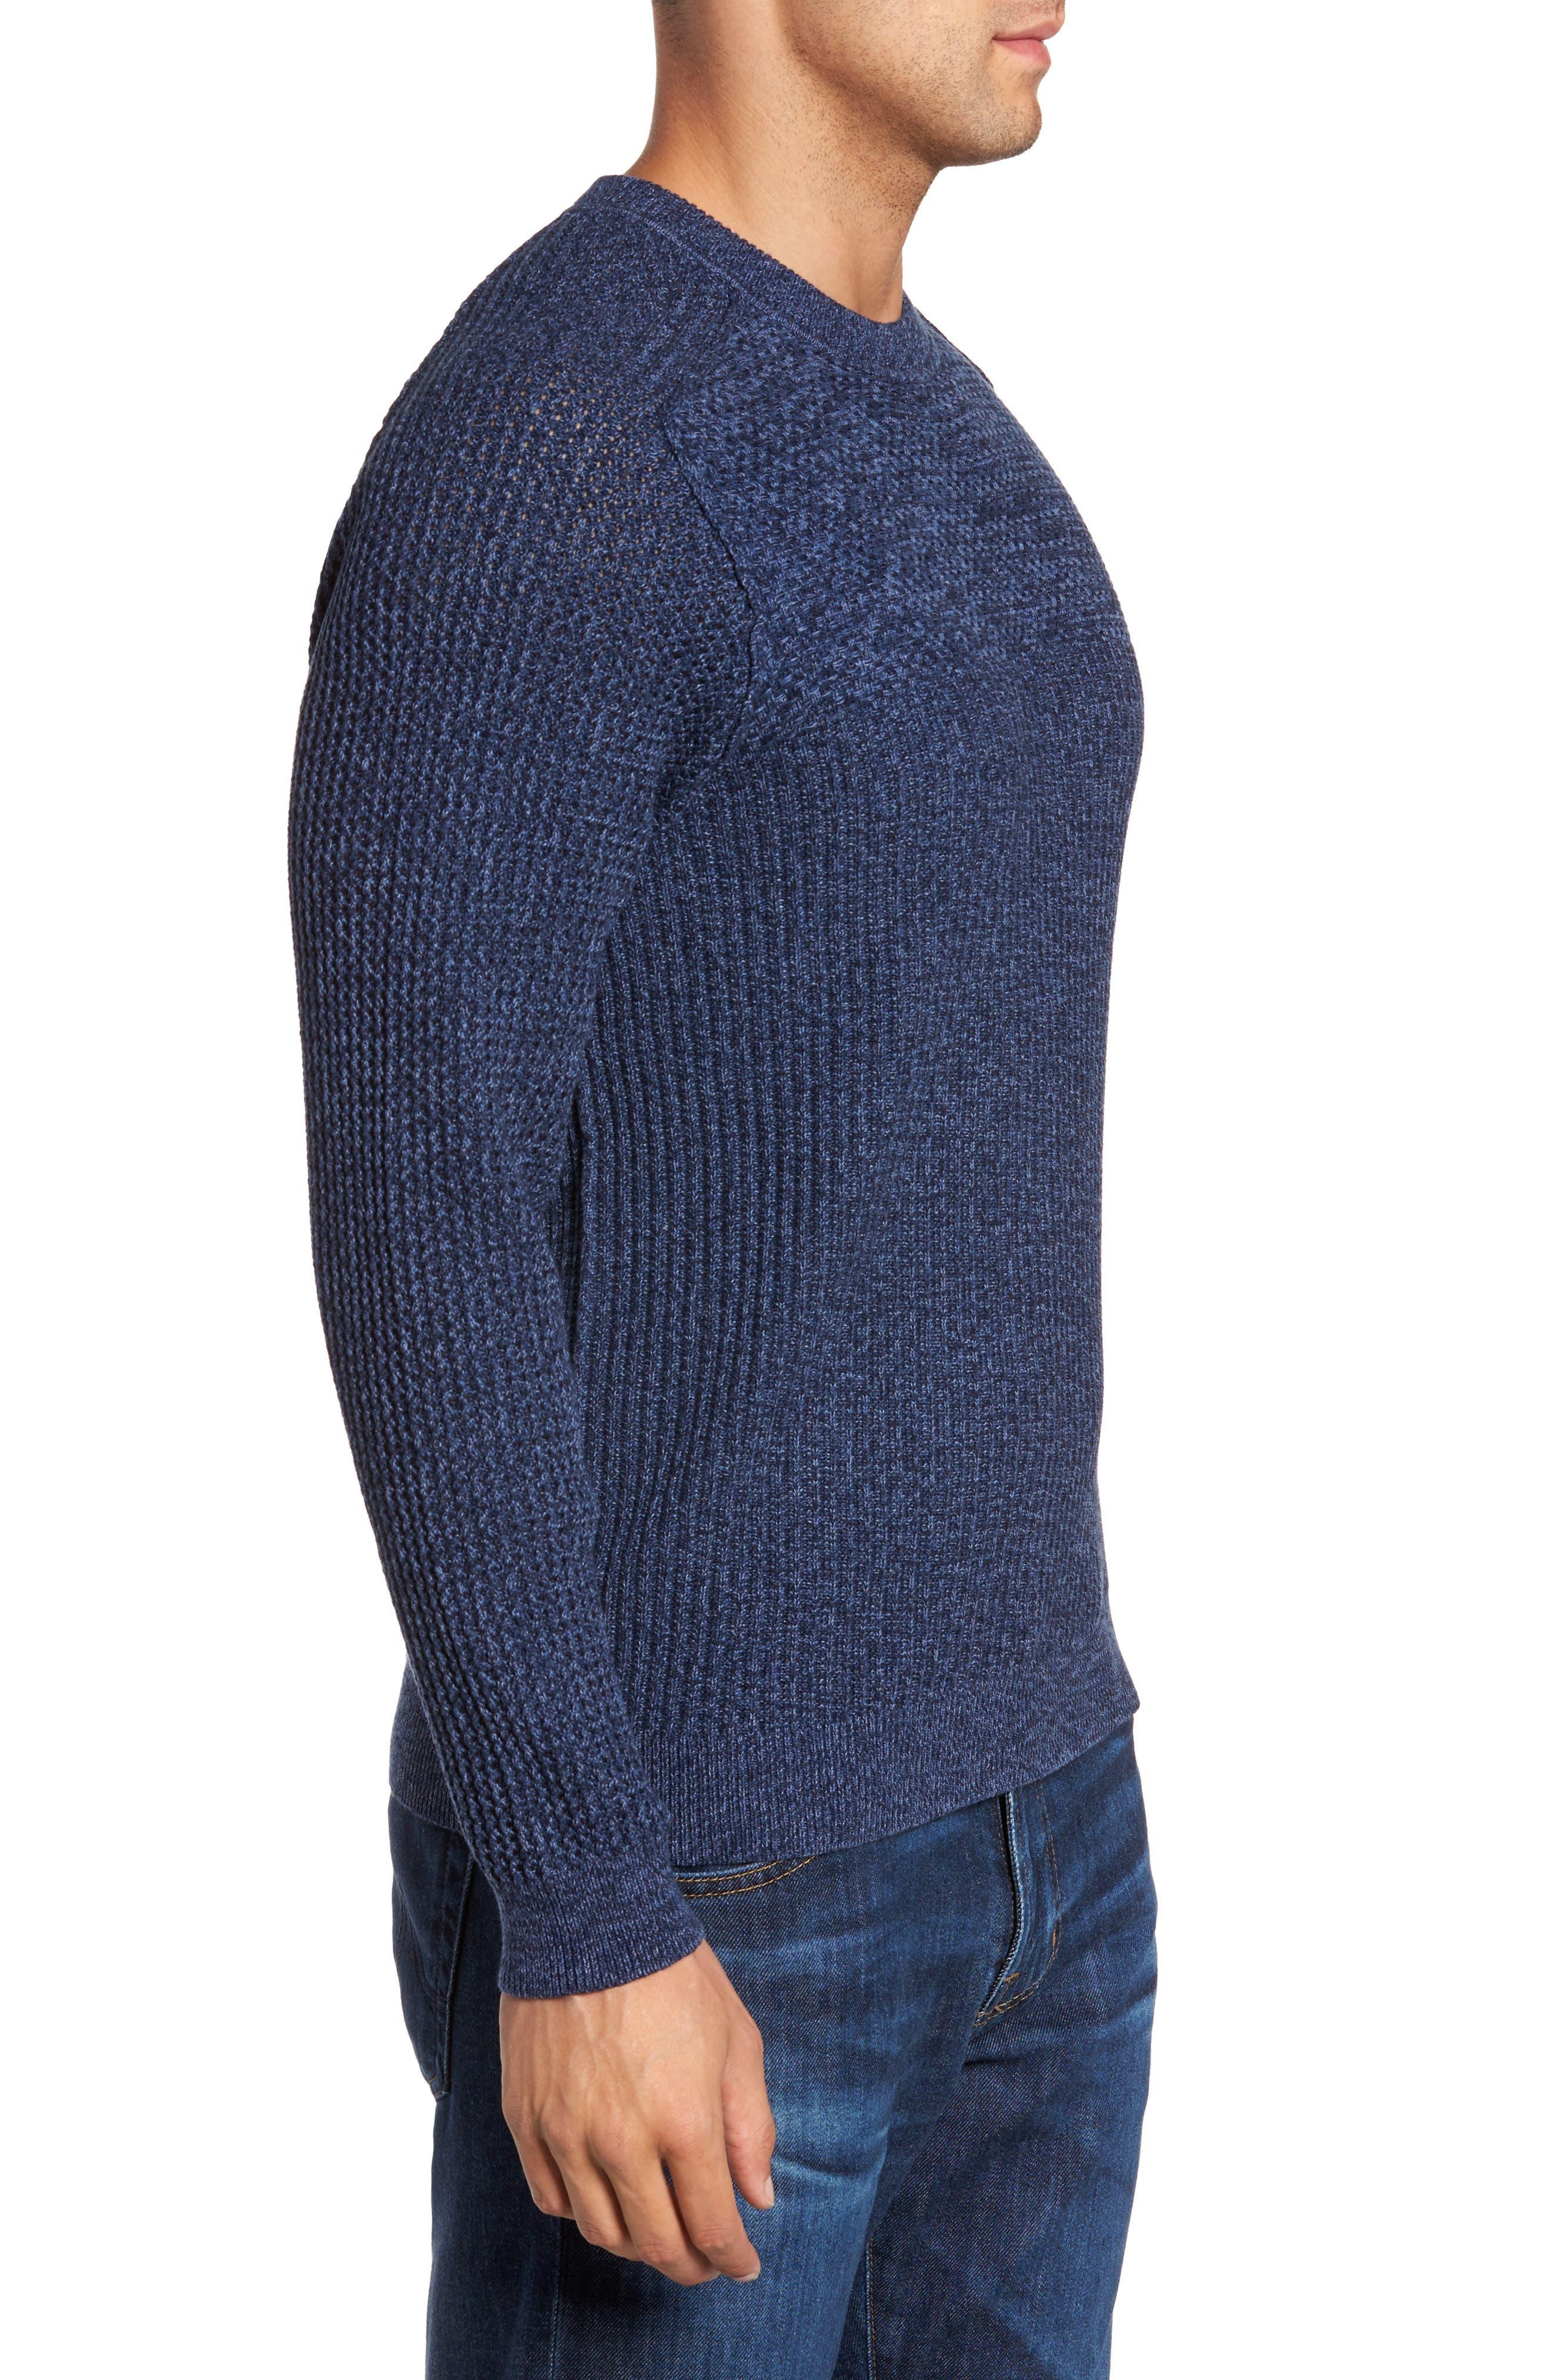 Medina Marl Cotton Sweater,                             Alternate thumbnail 3, color,                             001